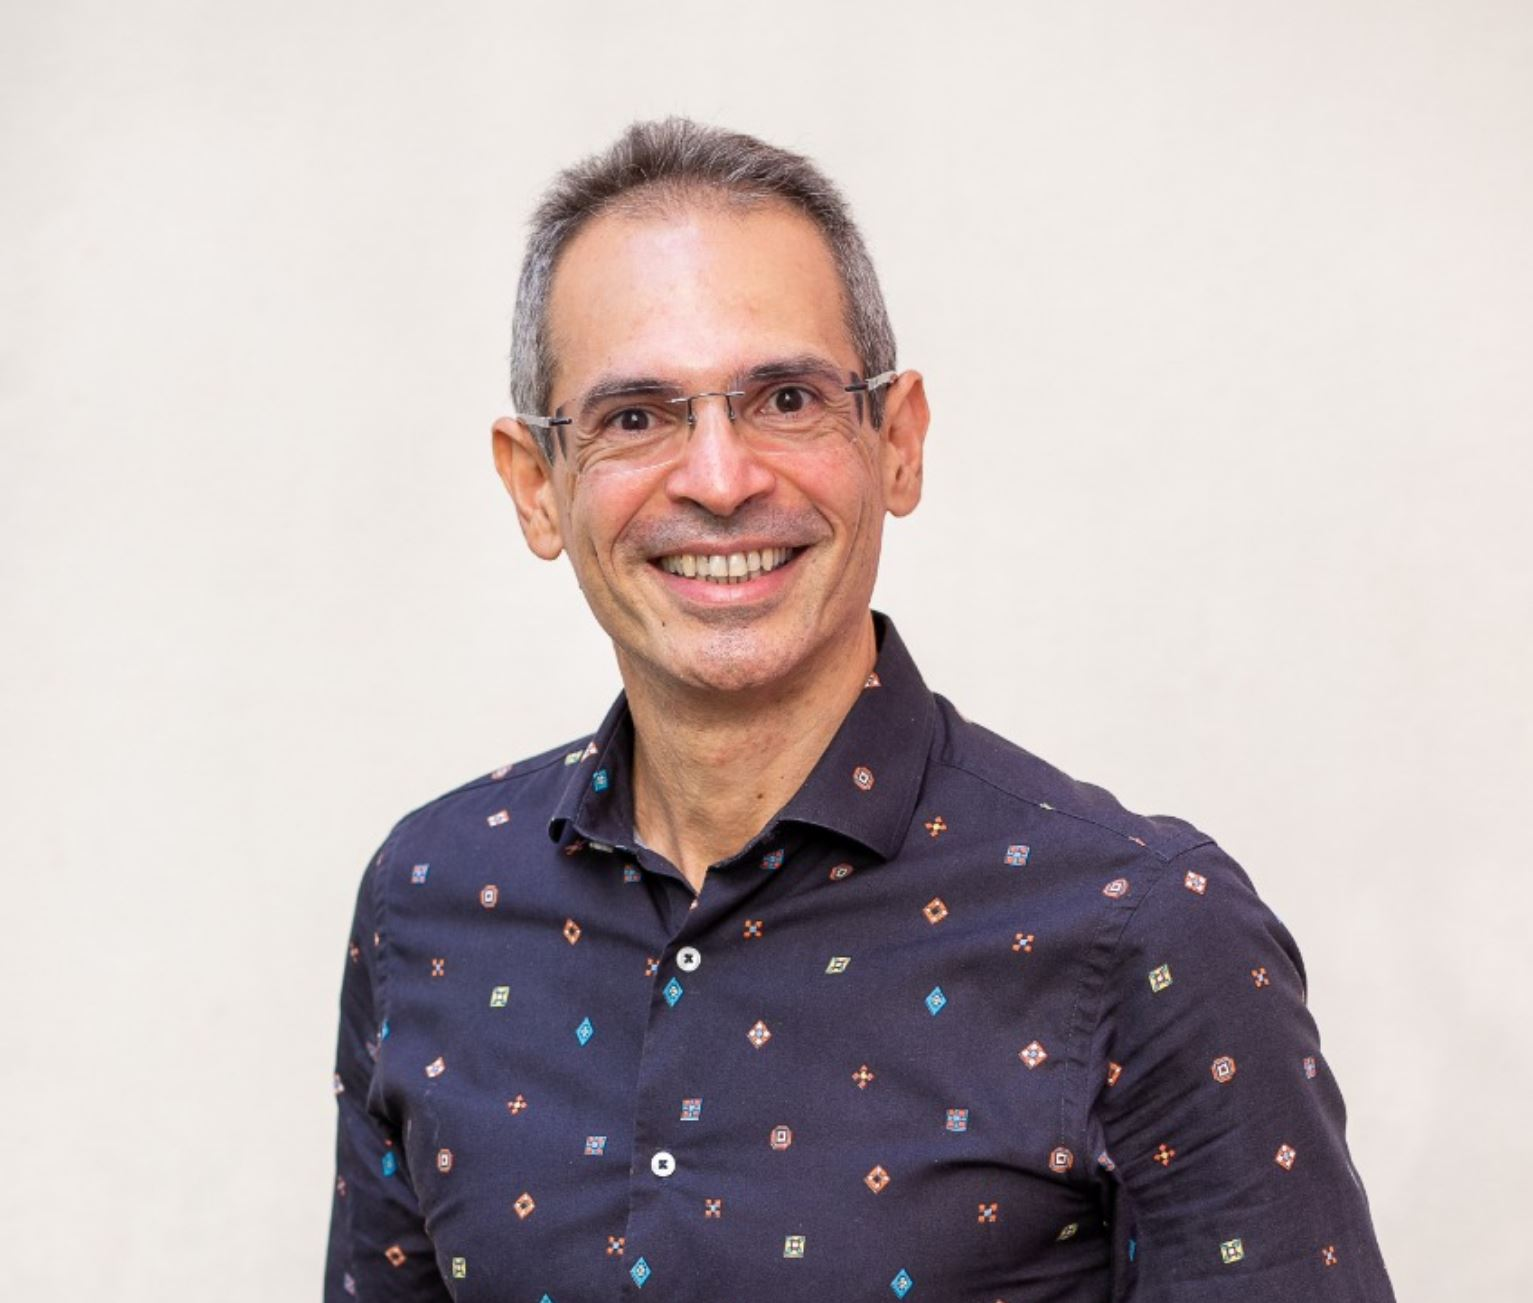 Luiz Mandarino (Empreendedorismo)